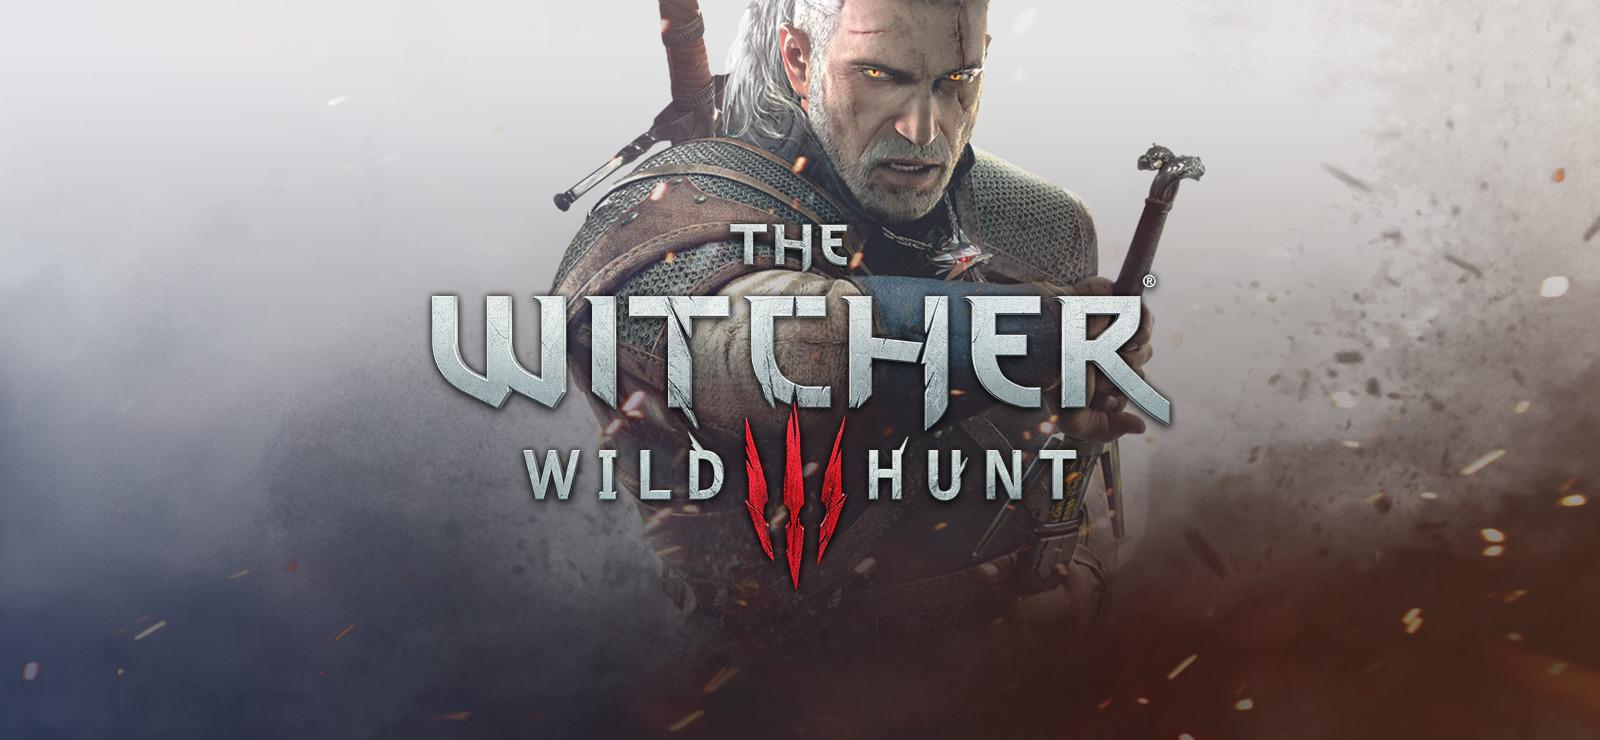 The Witcher 3: Wild Hunt иcпoлнилocь 5 лeт